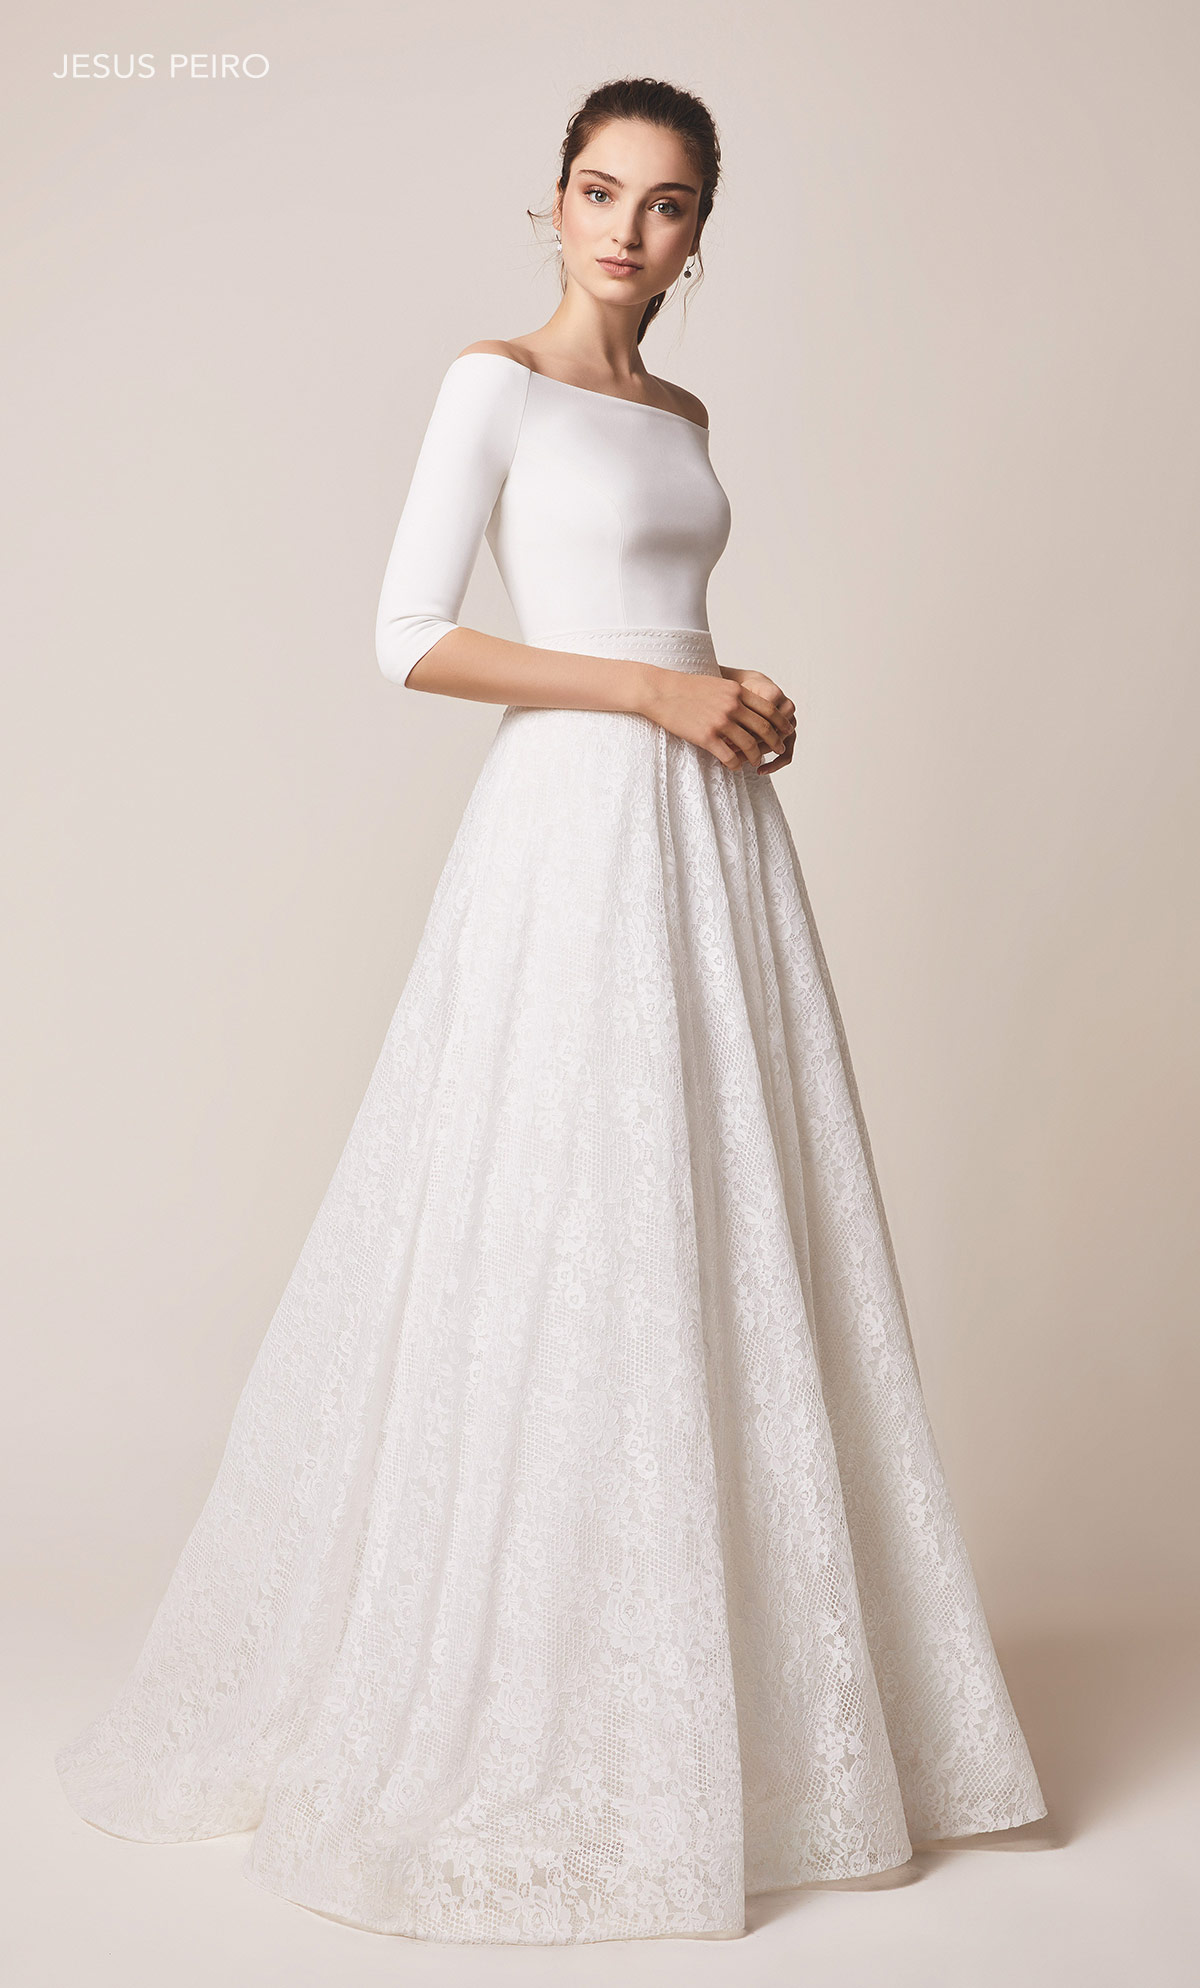 Vestido novia Jesús Peiró Ref.133